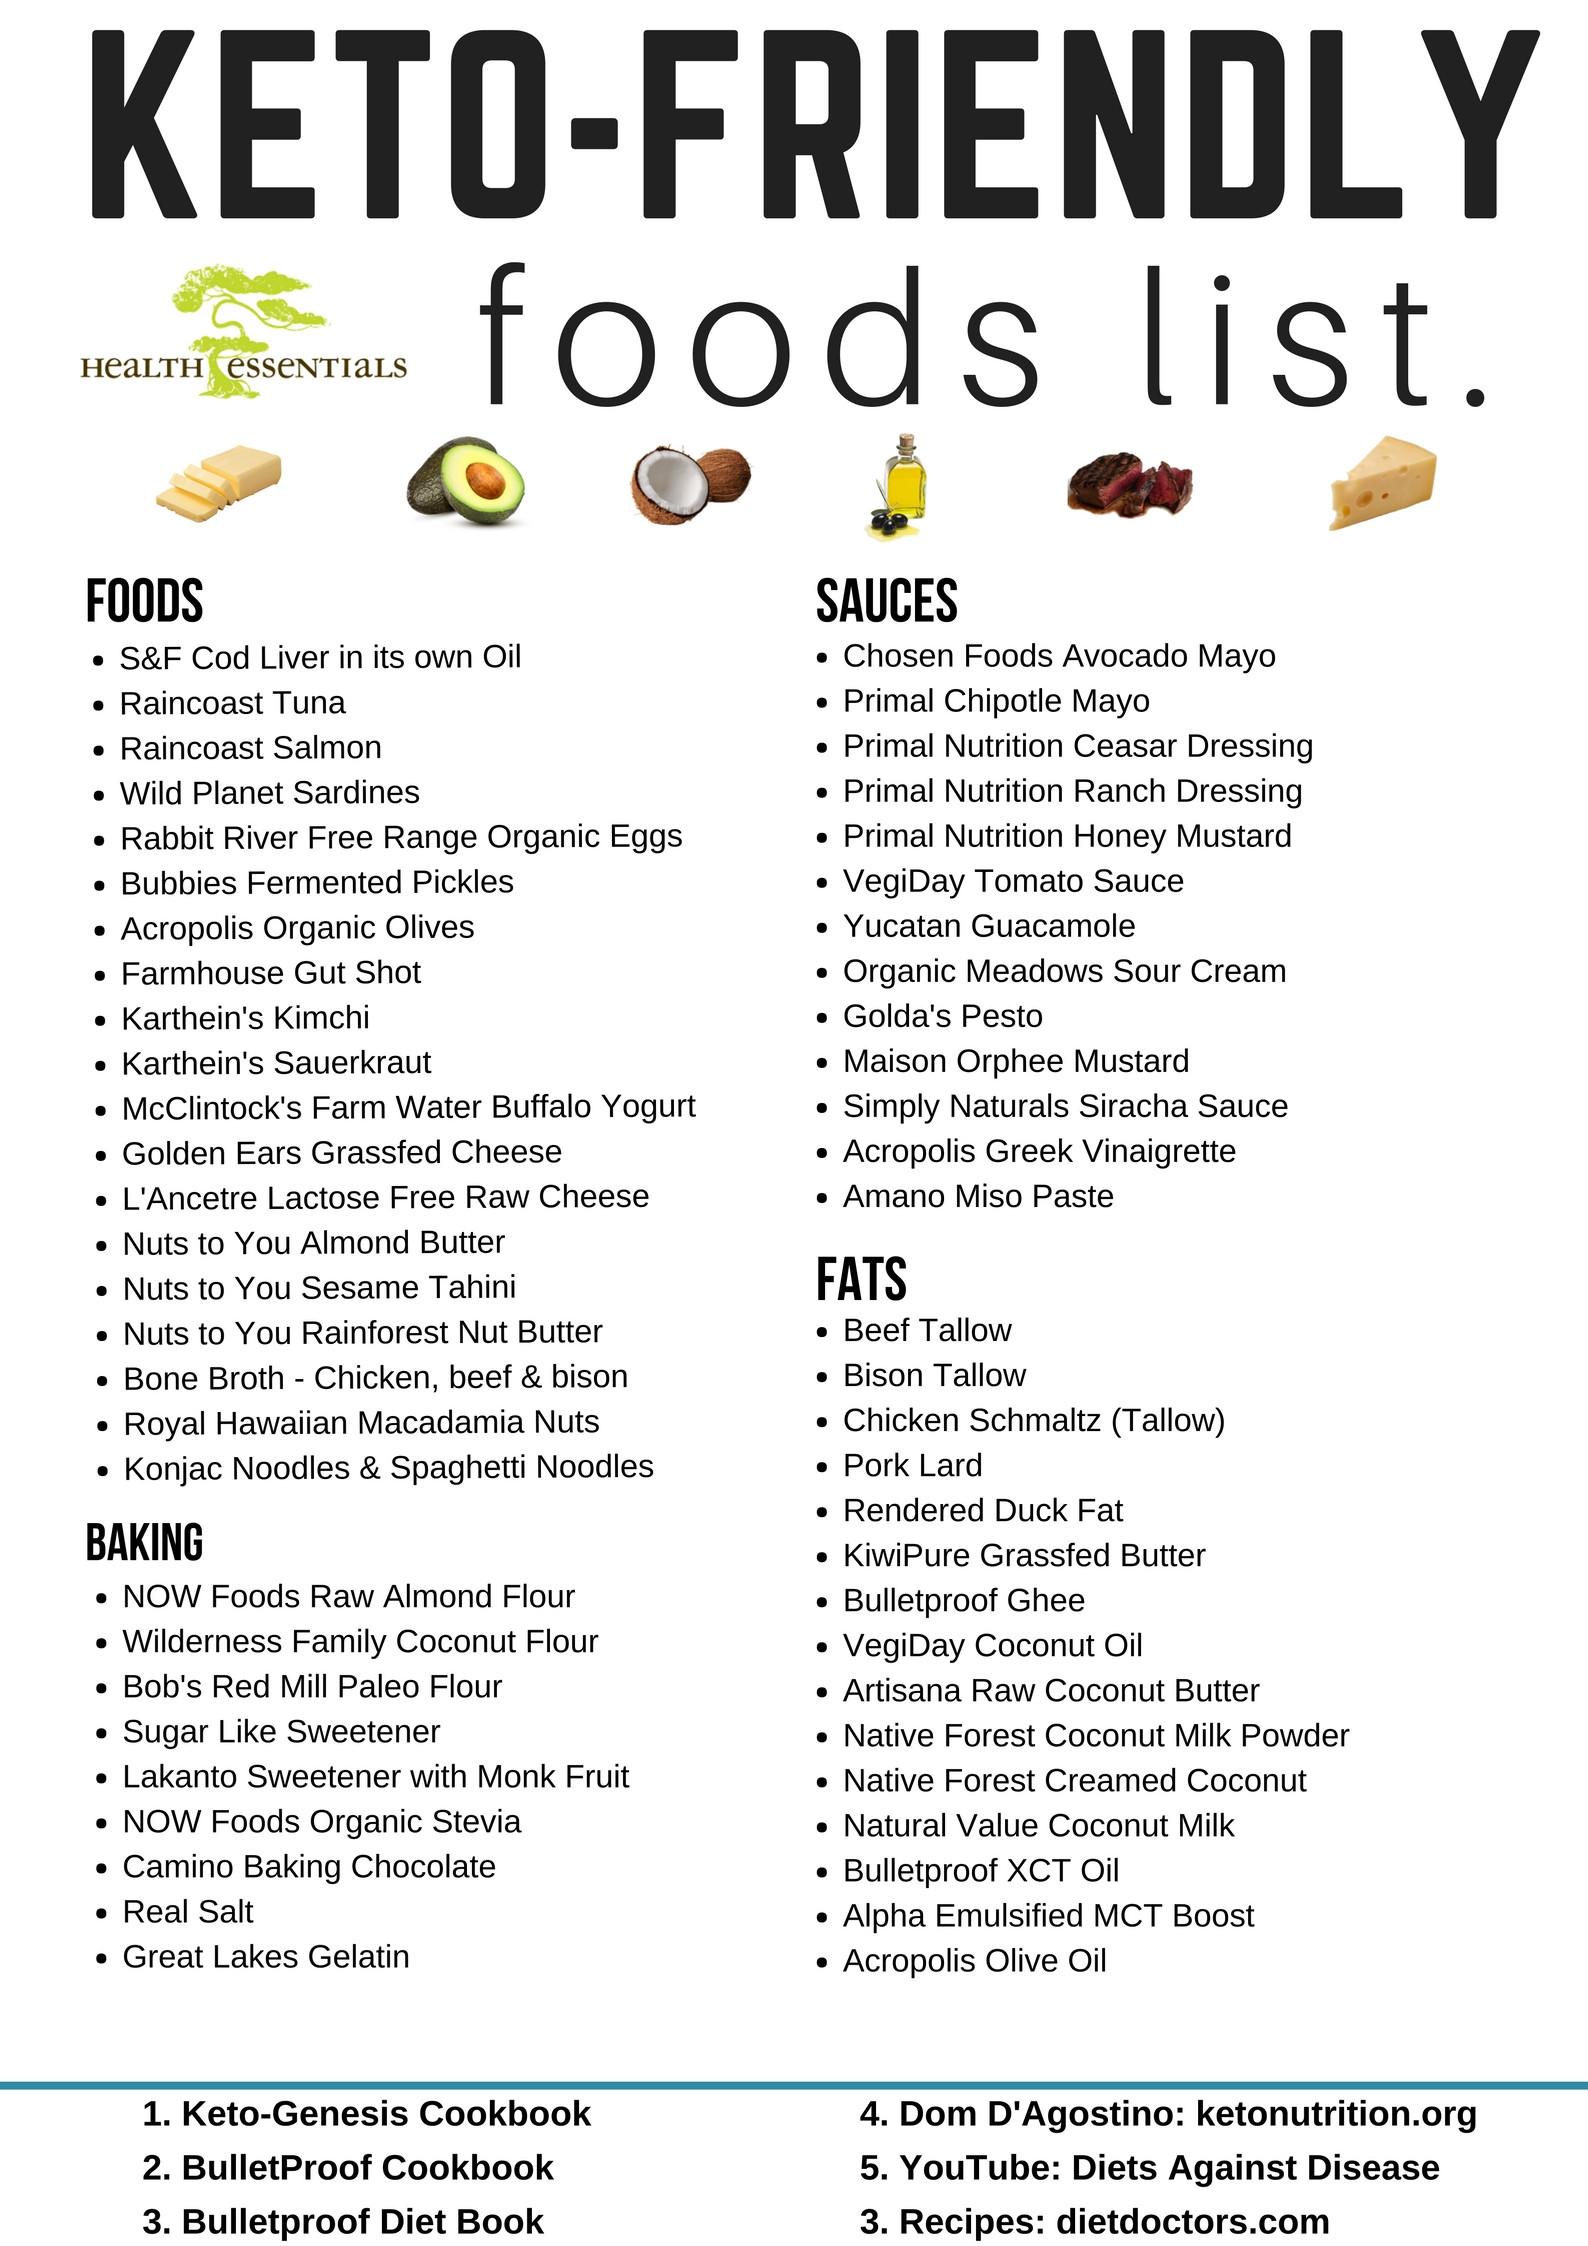 Keto Diet Products  Keto Friendly Foods Health Essentials